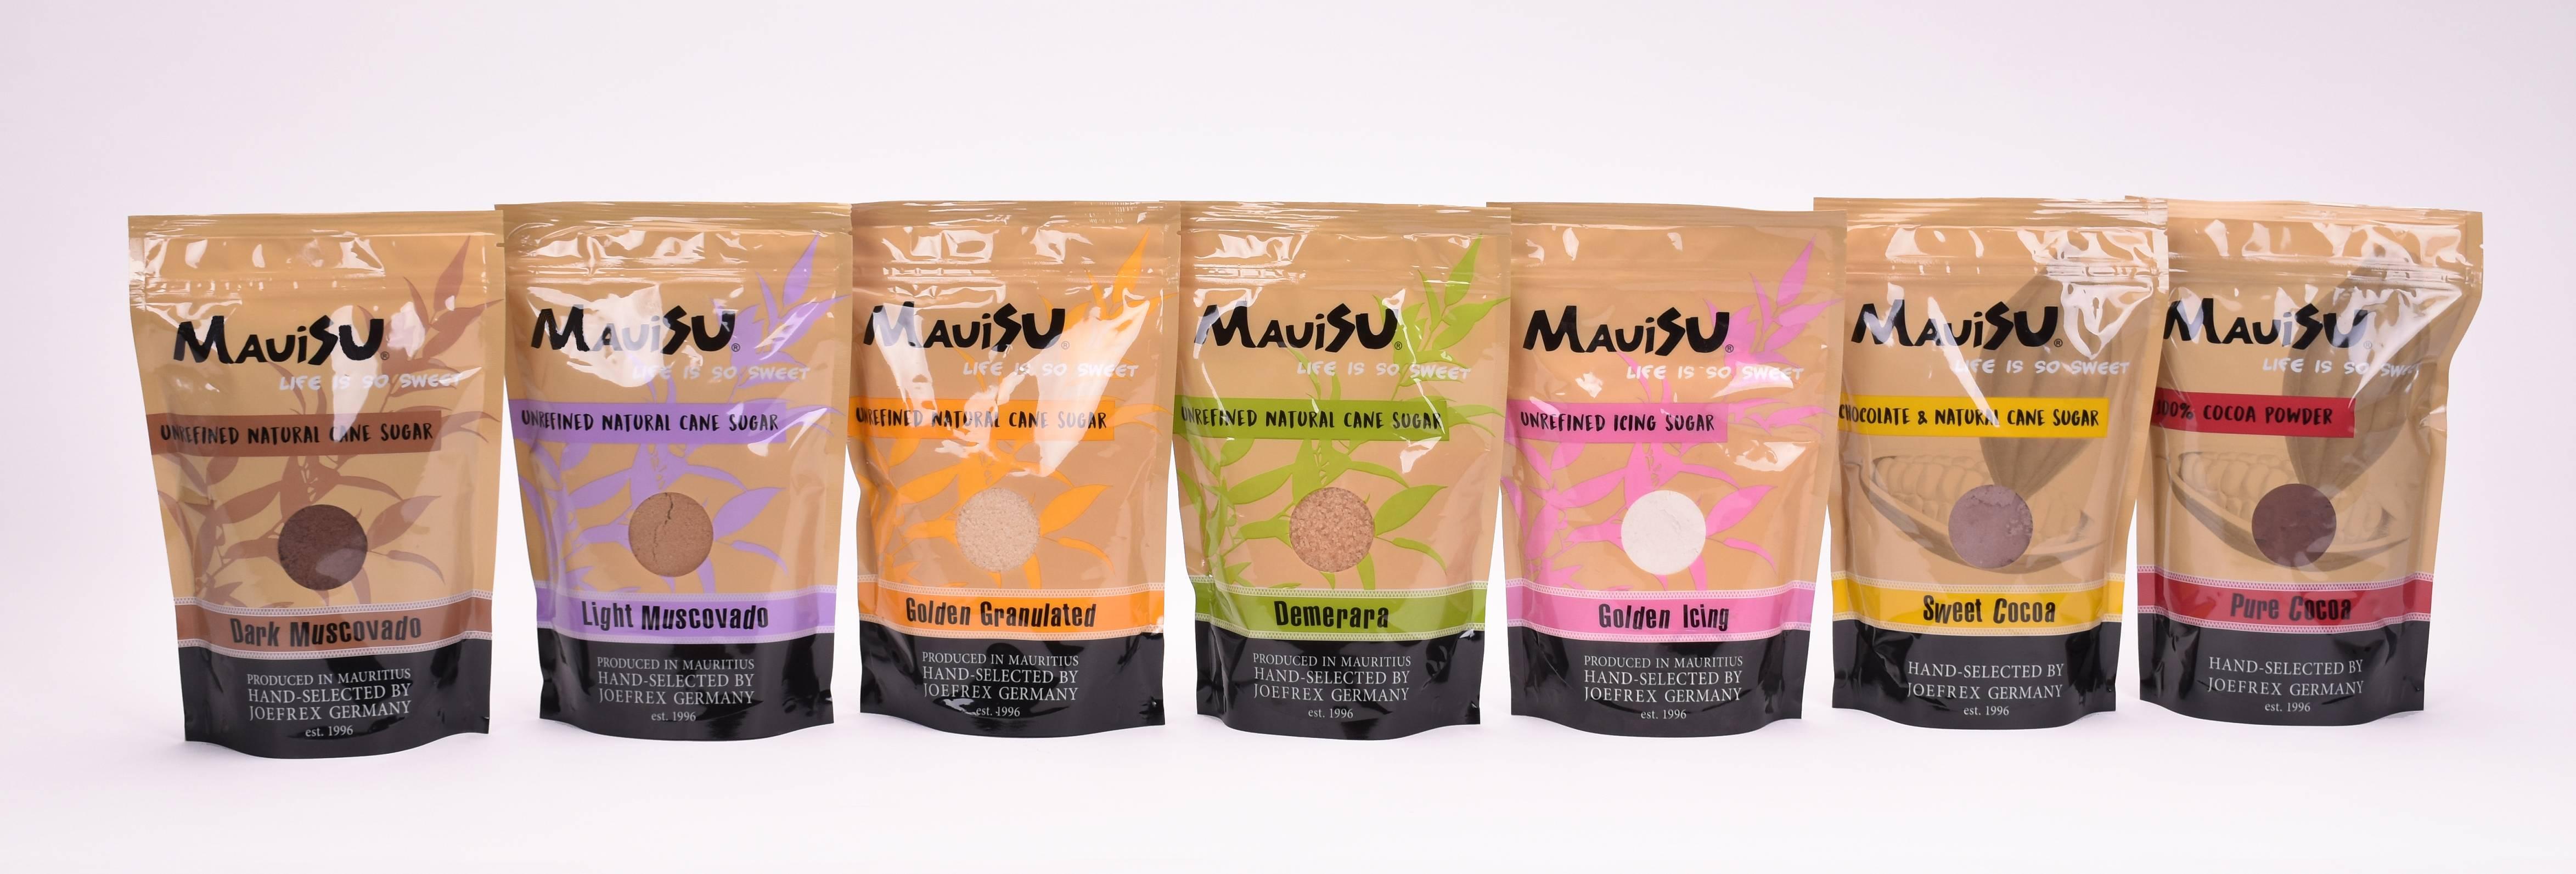 k-15-mauisu-cane-sugar